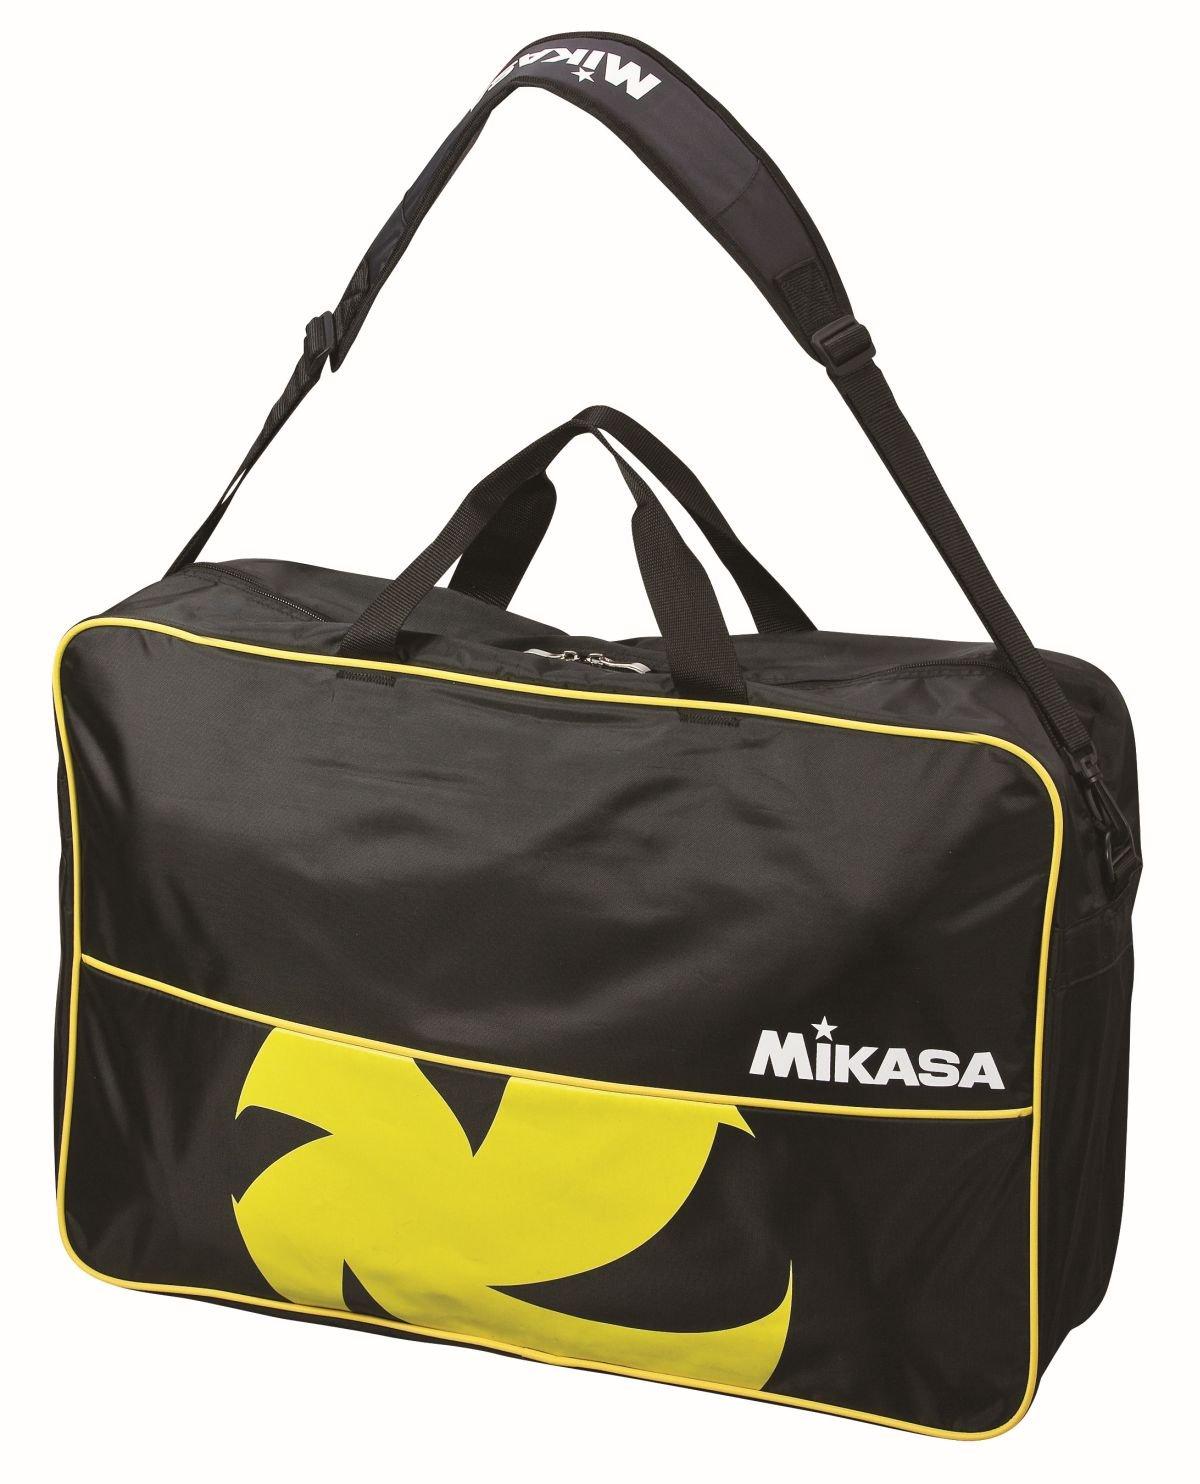 Mikasa Ball Bag Volleyball, Black/Yellow, 60.0x 40.0x 2.0cm, 18.0Litres, 1938